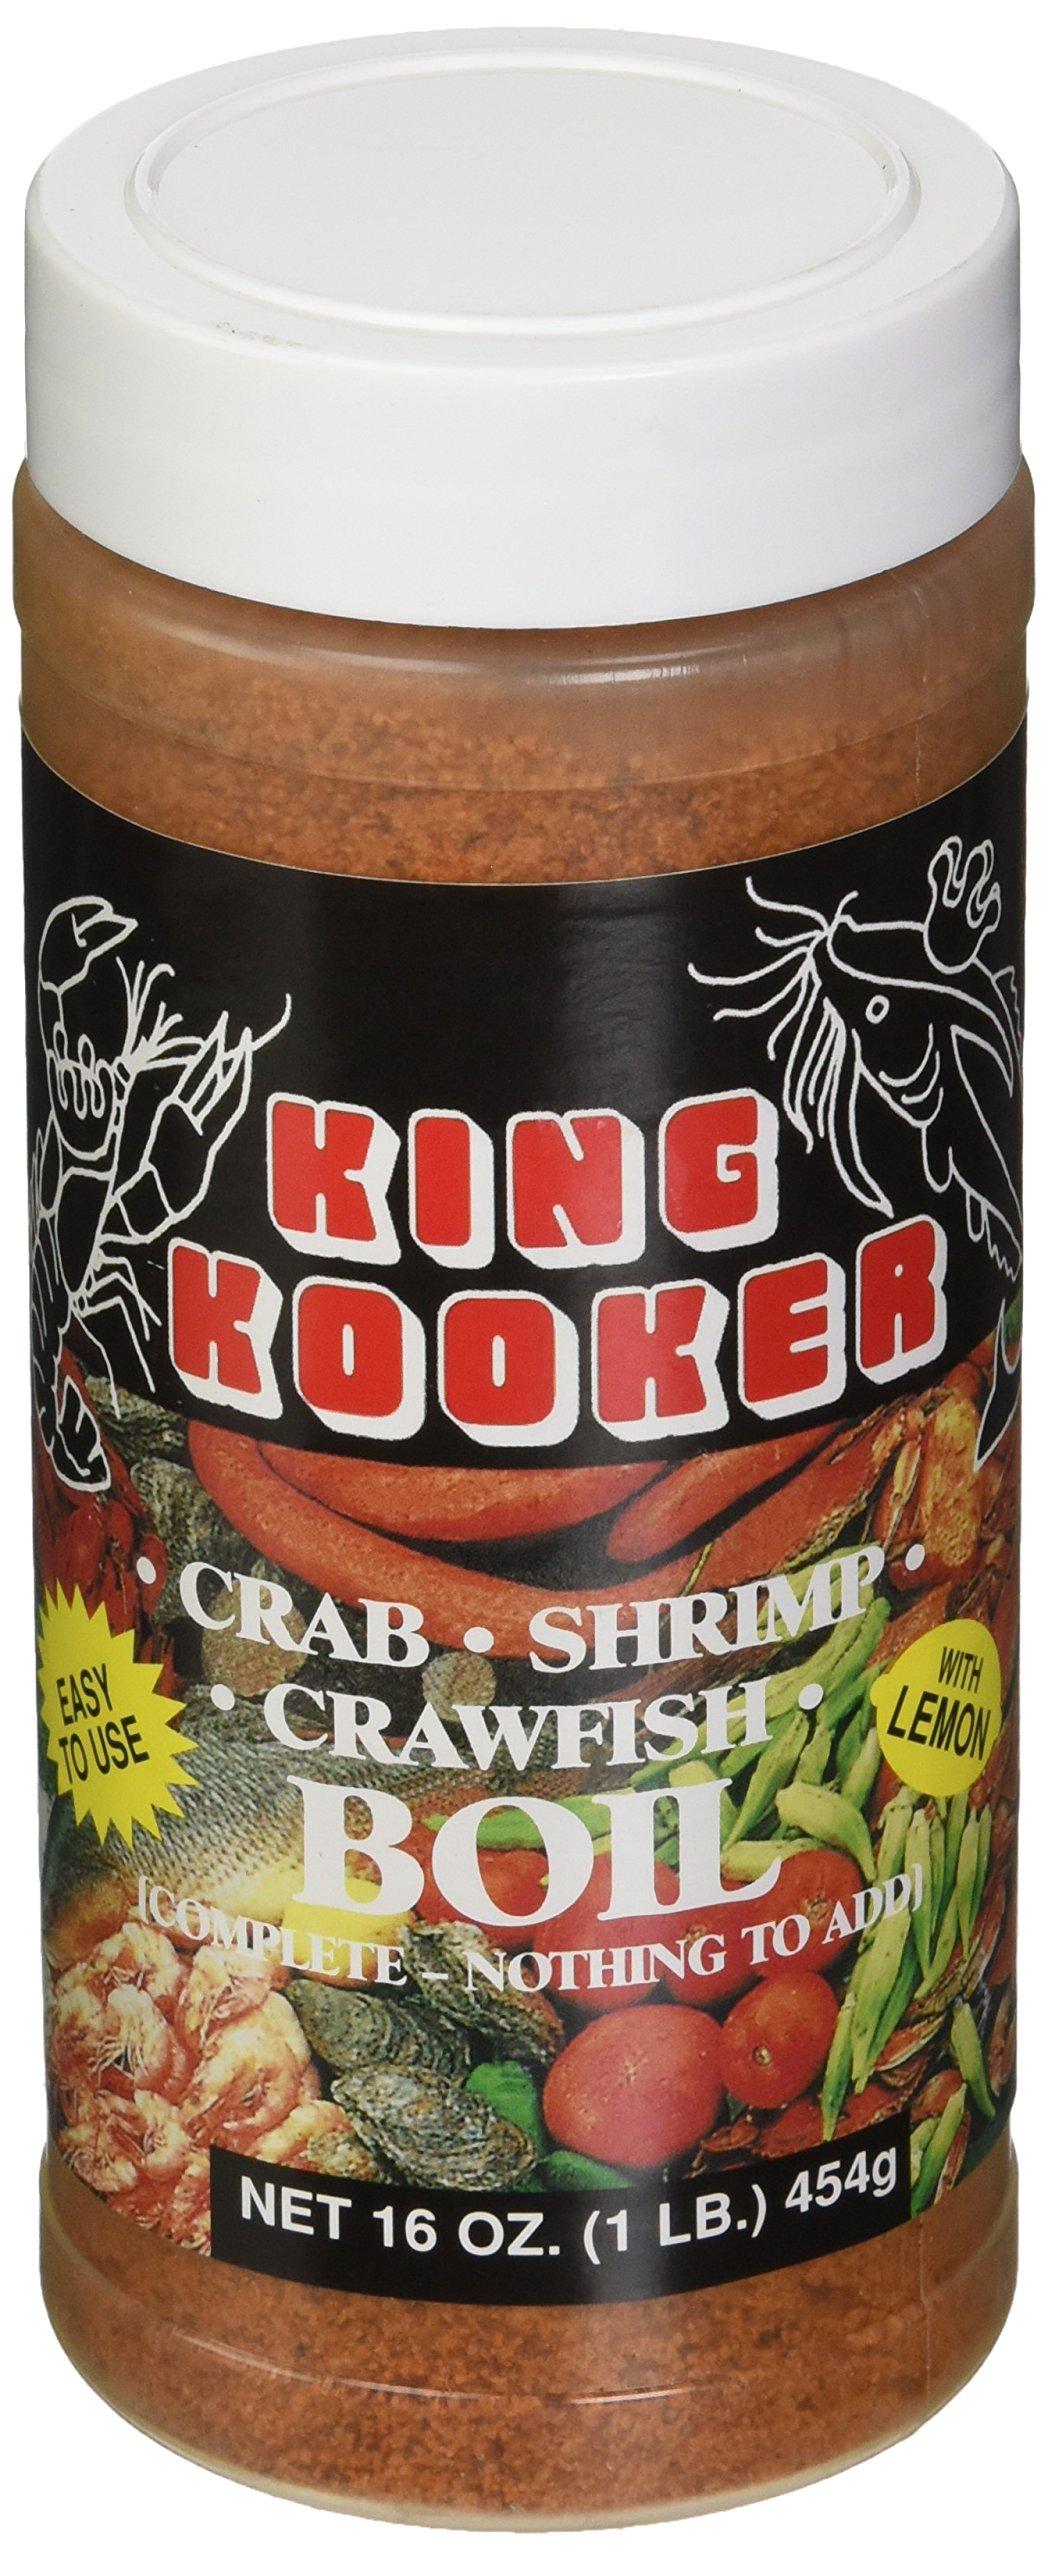 King Kooker 00037 16-Ounce Crab, Shrimp, Crawfish Boil